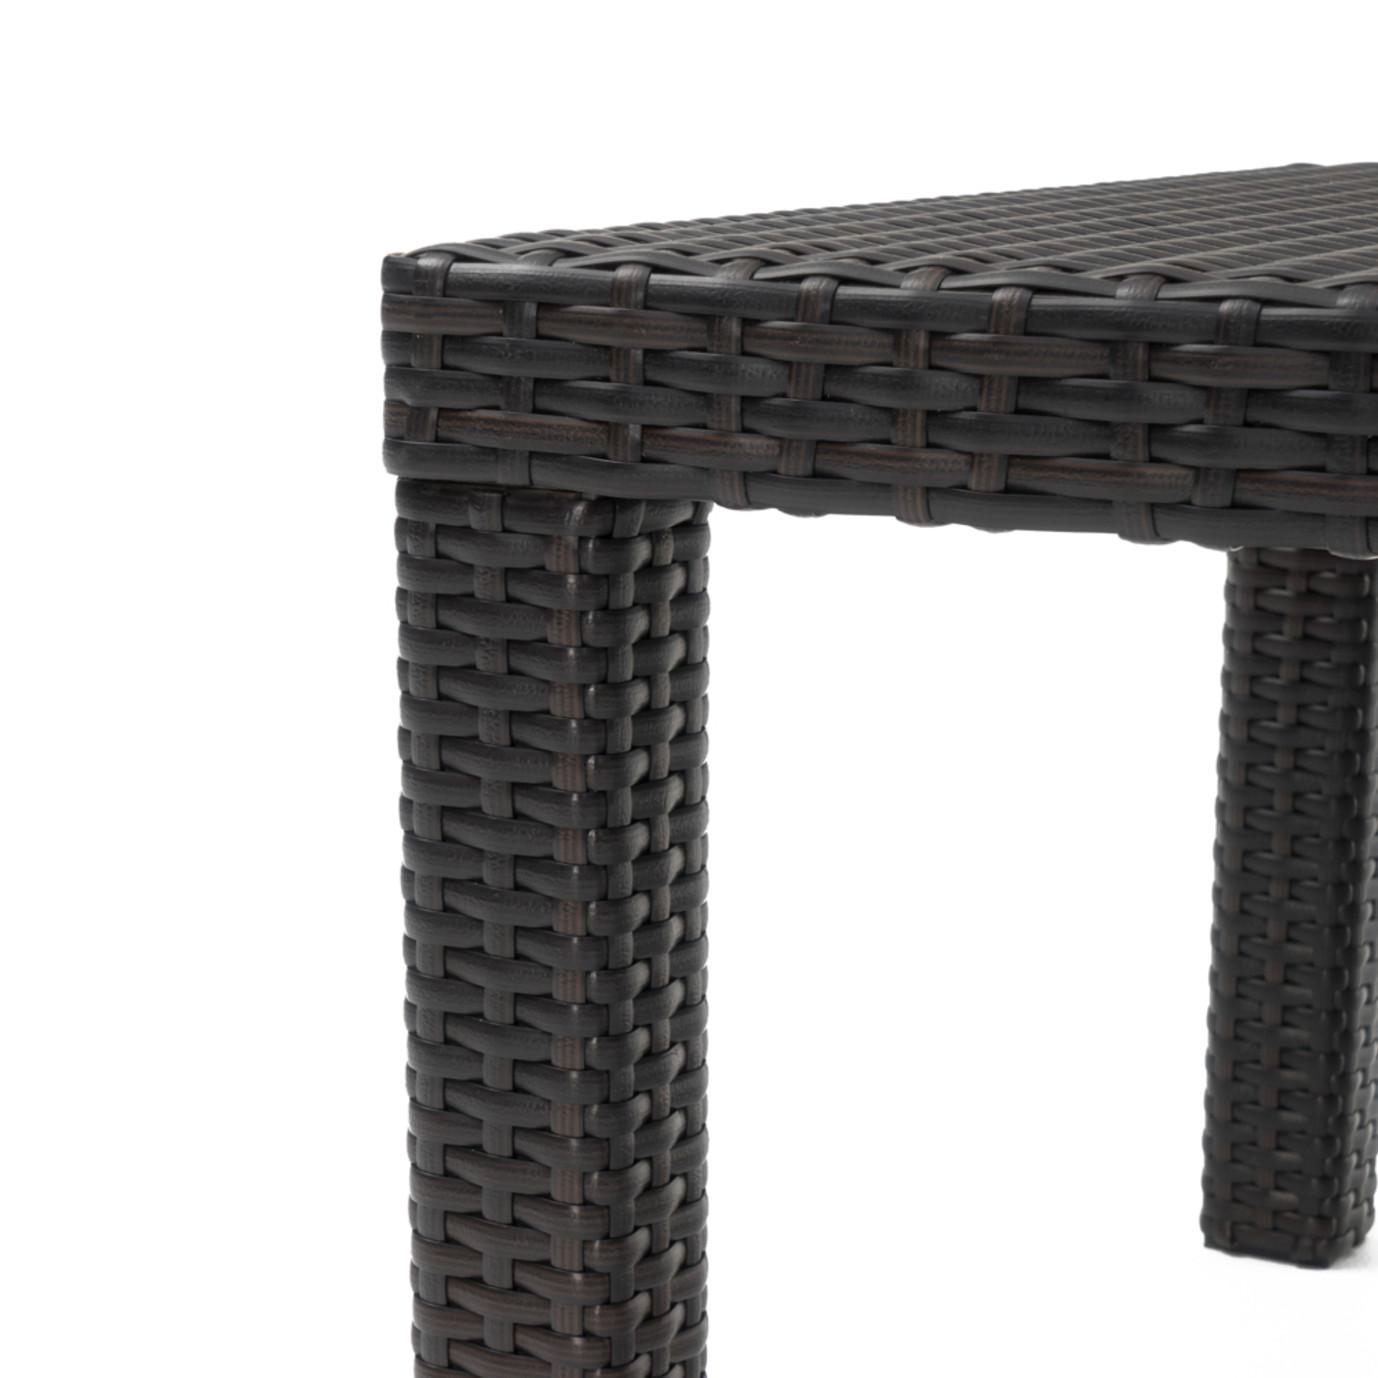 Deco™ 8pc Sofa Set with Furniture Covers - Tikka Orange